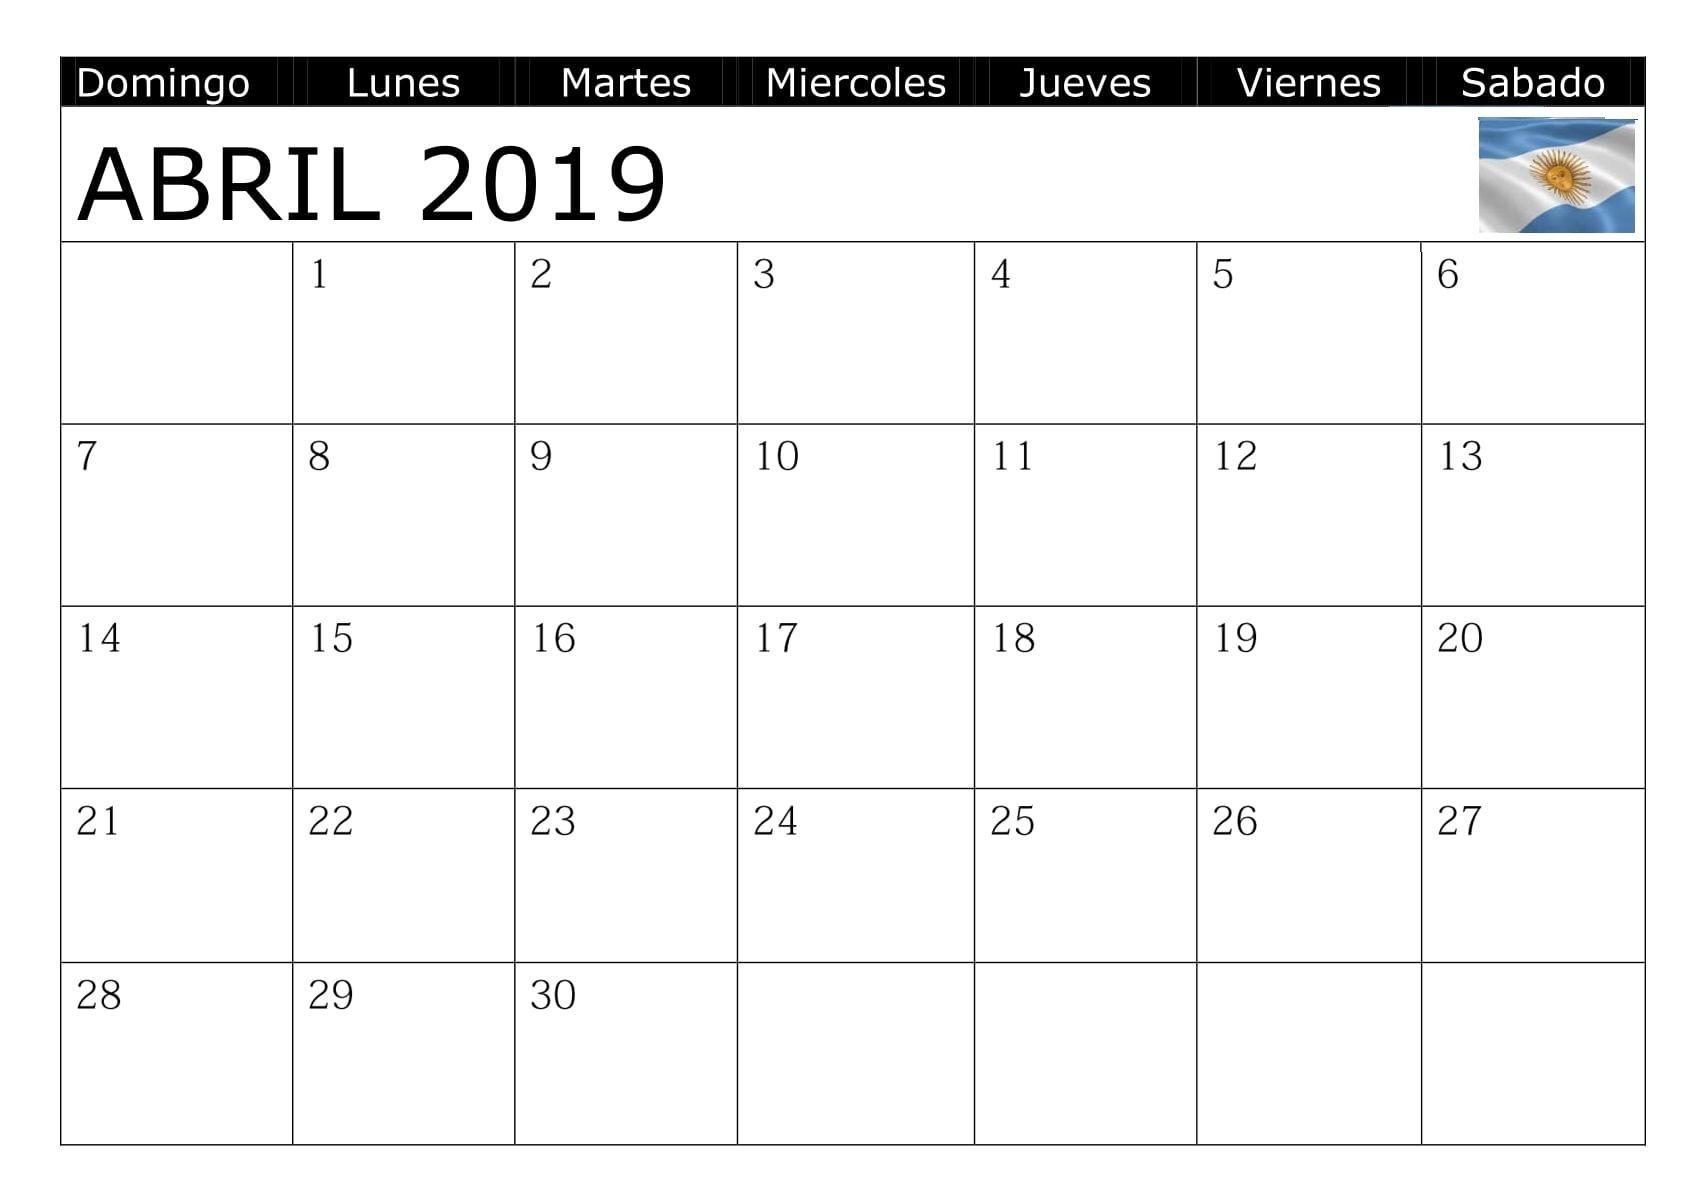 Calendario 2019 Mes Abril Actual 33 Best Calendário Abril 2019 Imprimir Images On Pinterest In 2019 Of Calendario 2019 Mes Abril Recientes Calendario Para Imprimir 2019 Enero Calendario Imprimir Enero